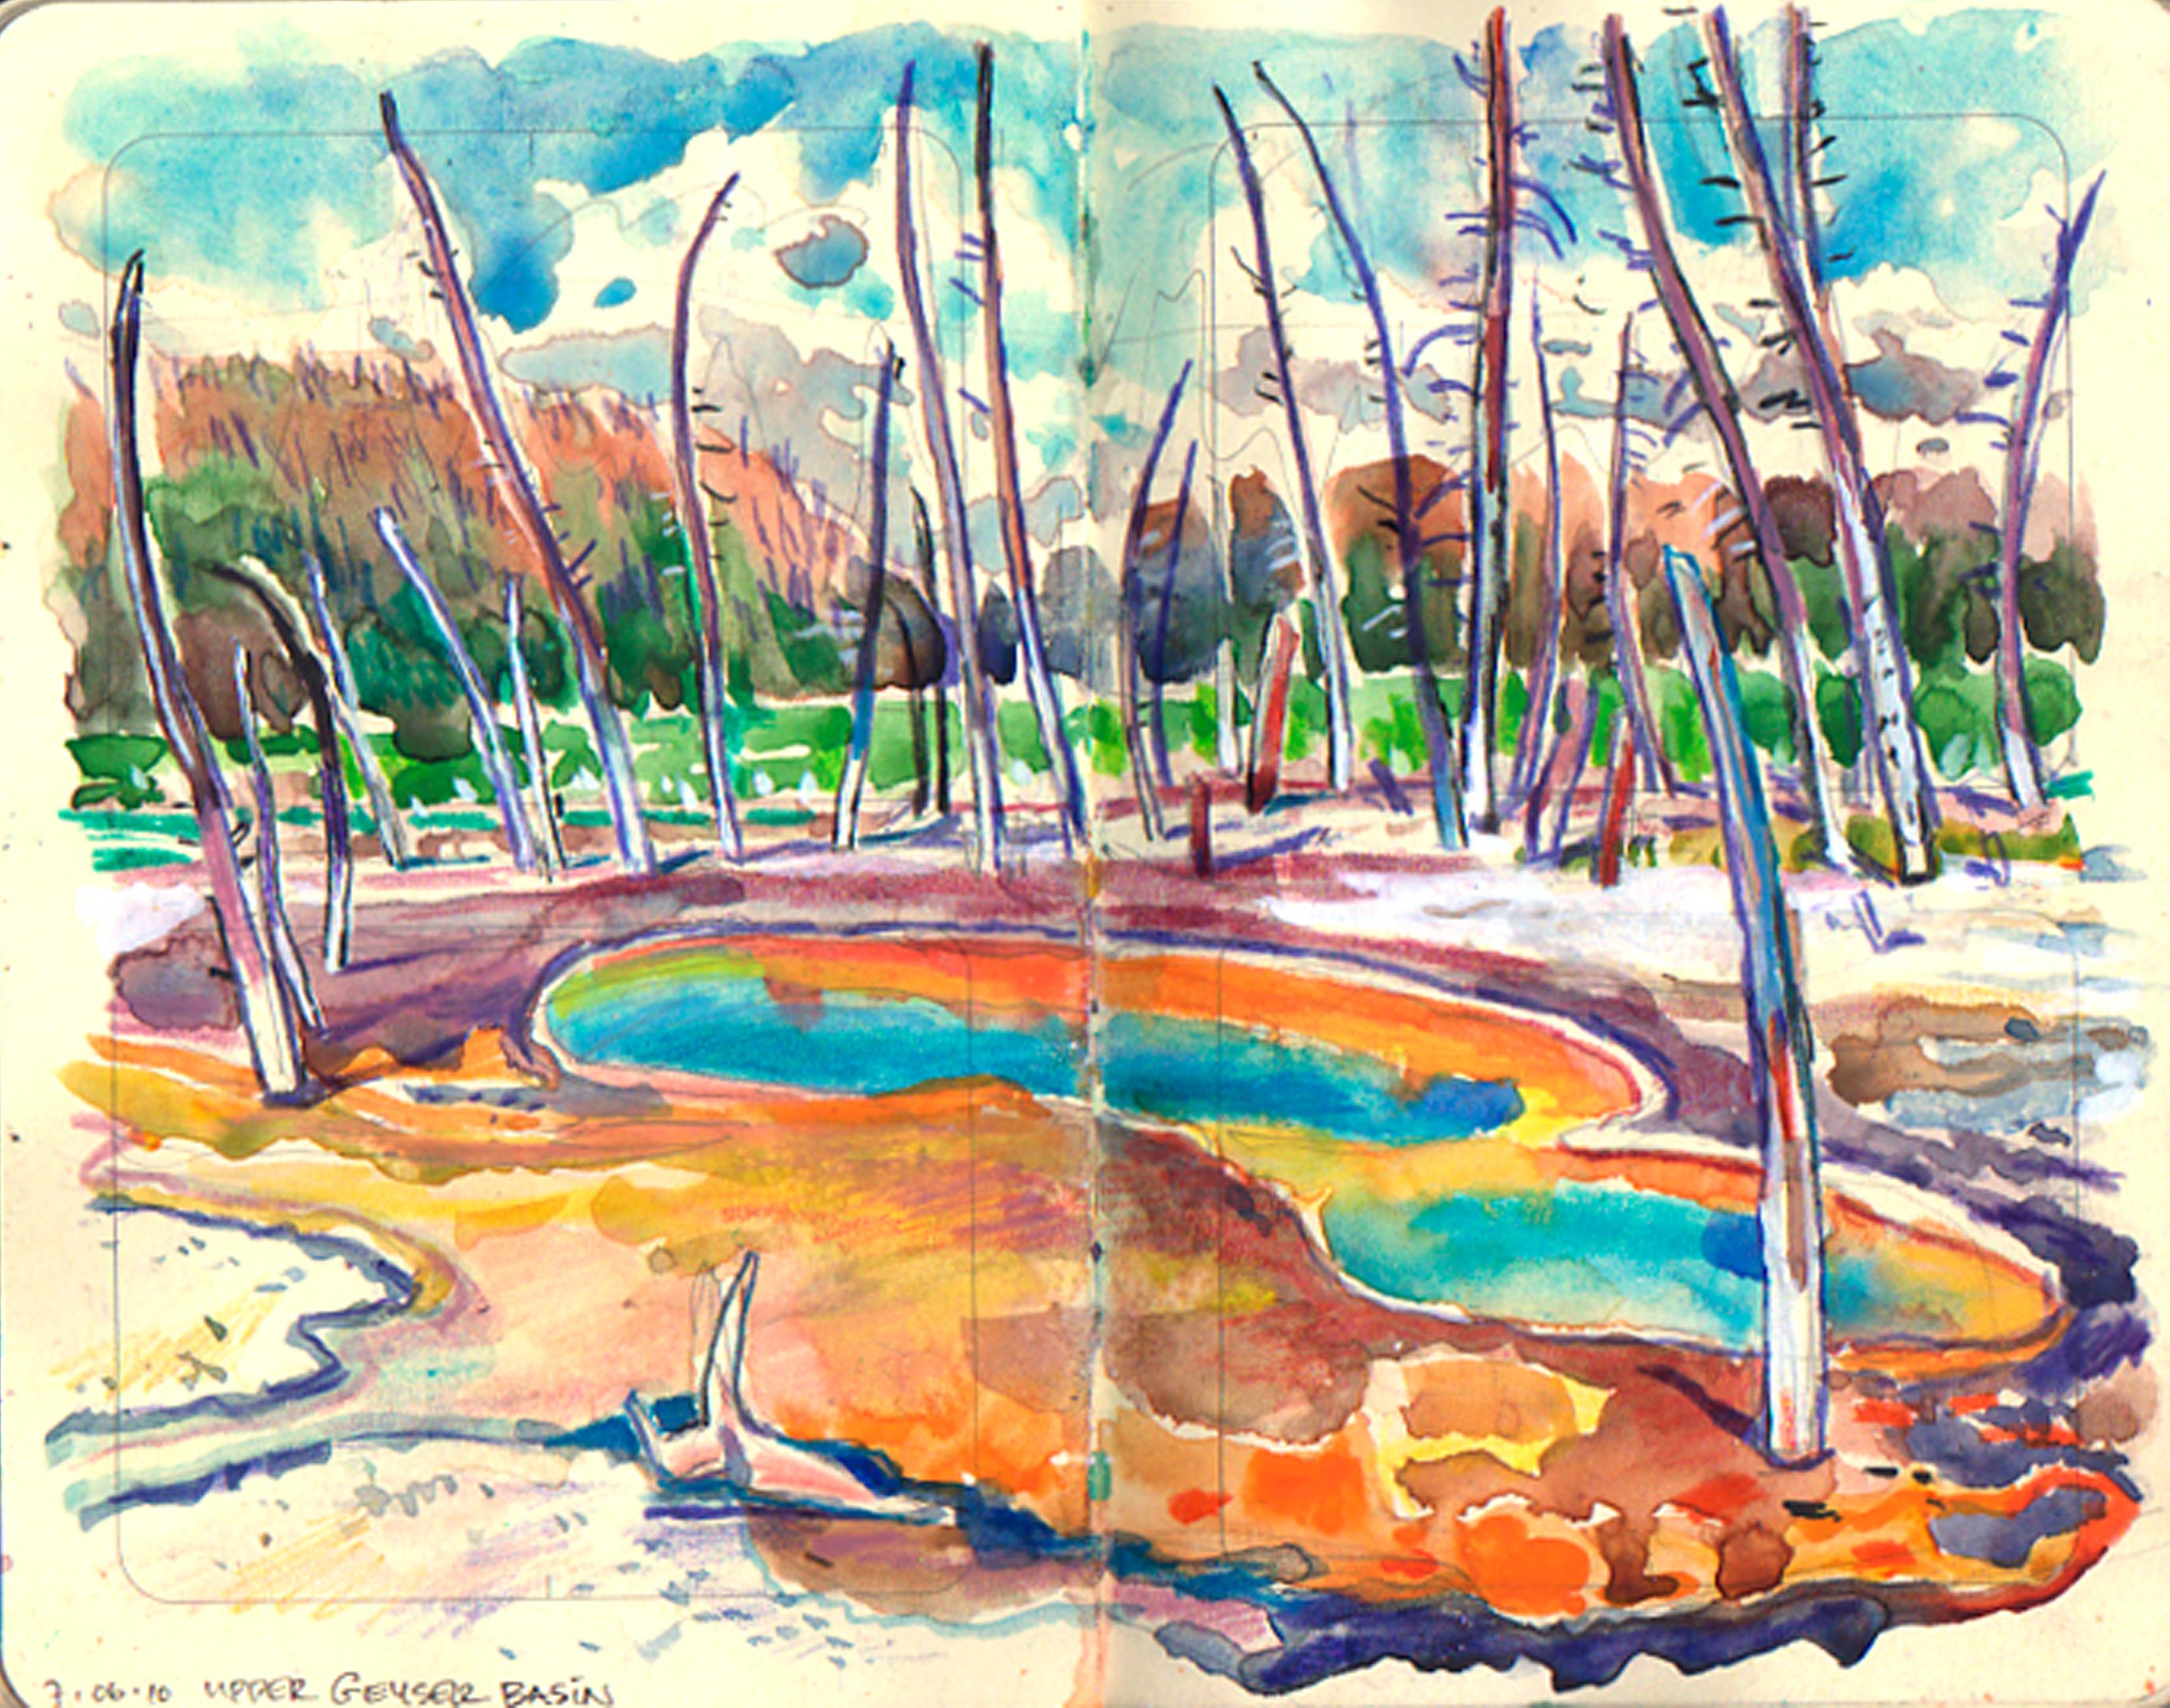 Yellowstone hot pool & dead trees